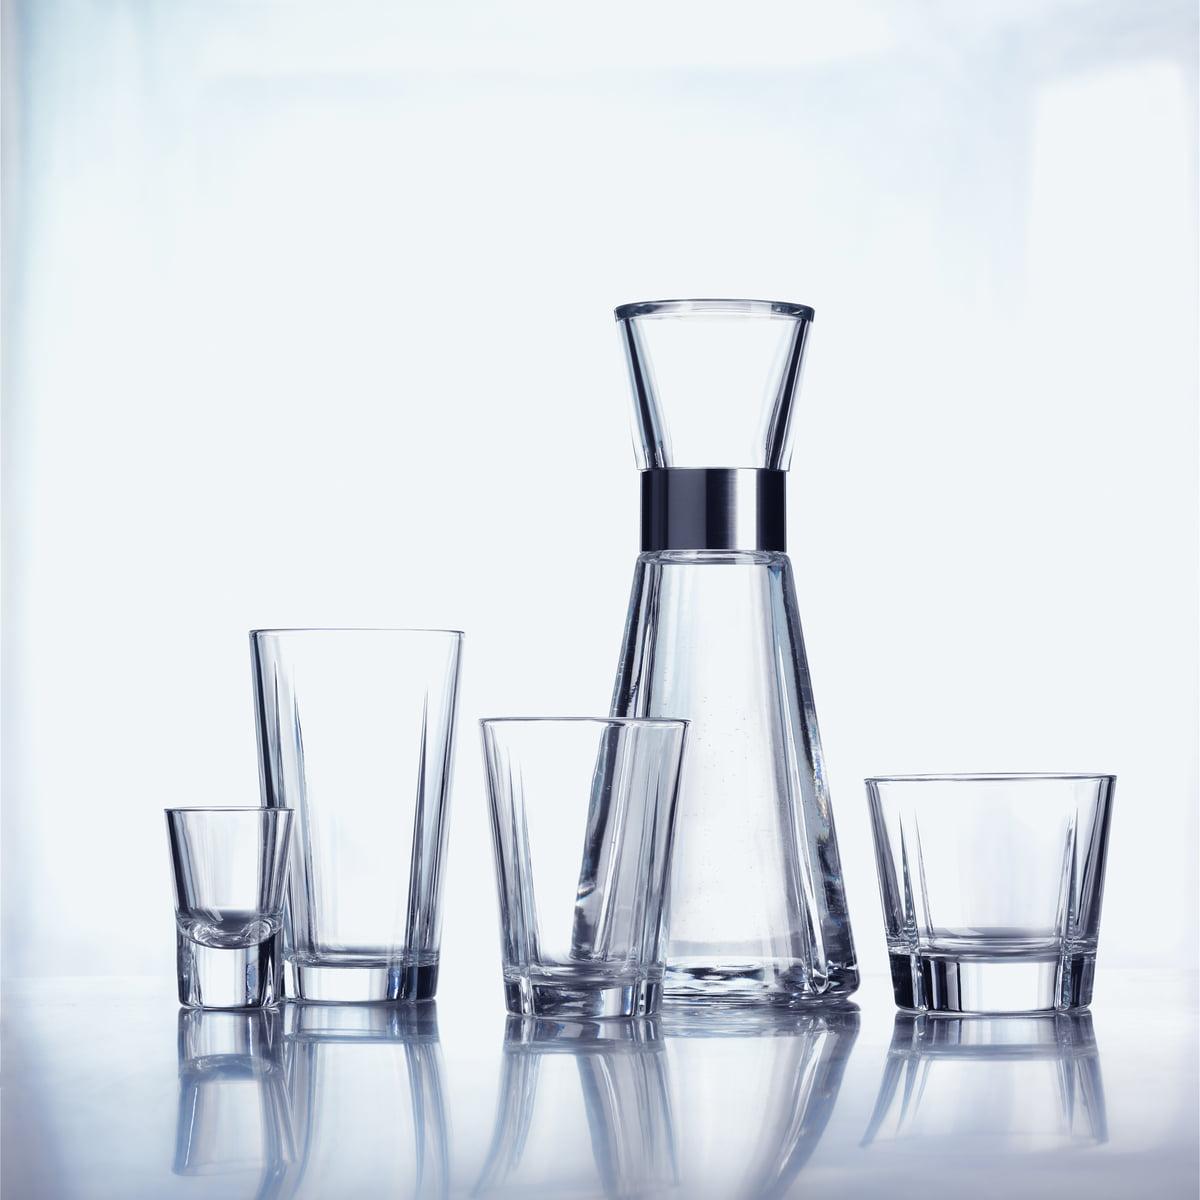 Grand Cru vandglas | Rosendahl | Shop